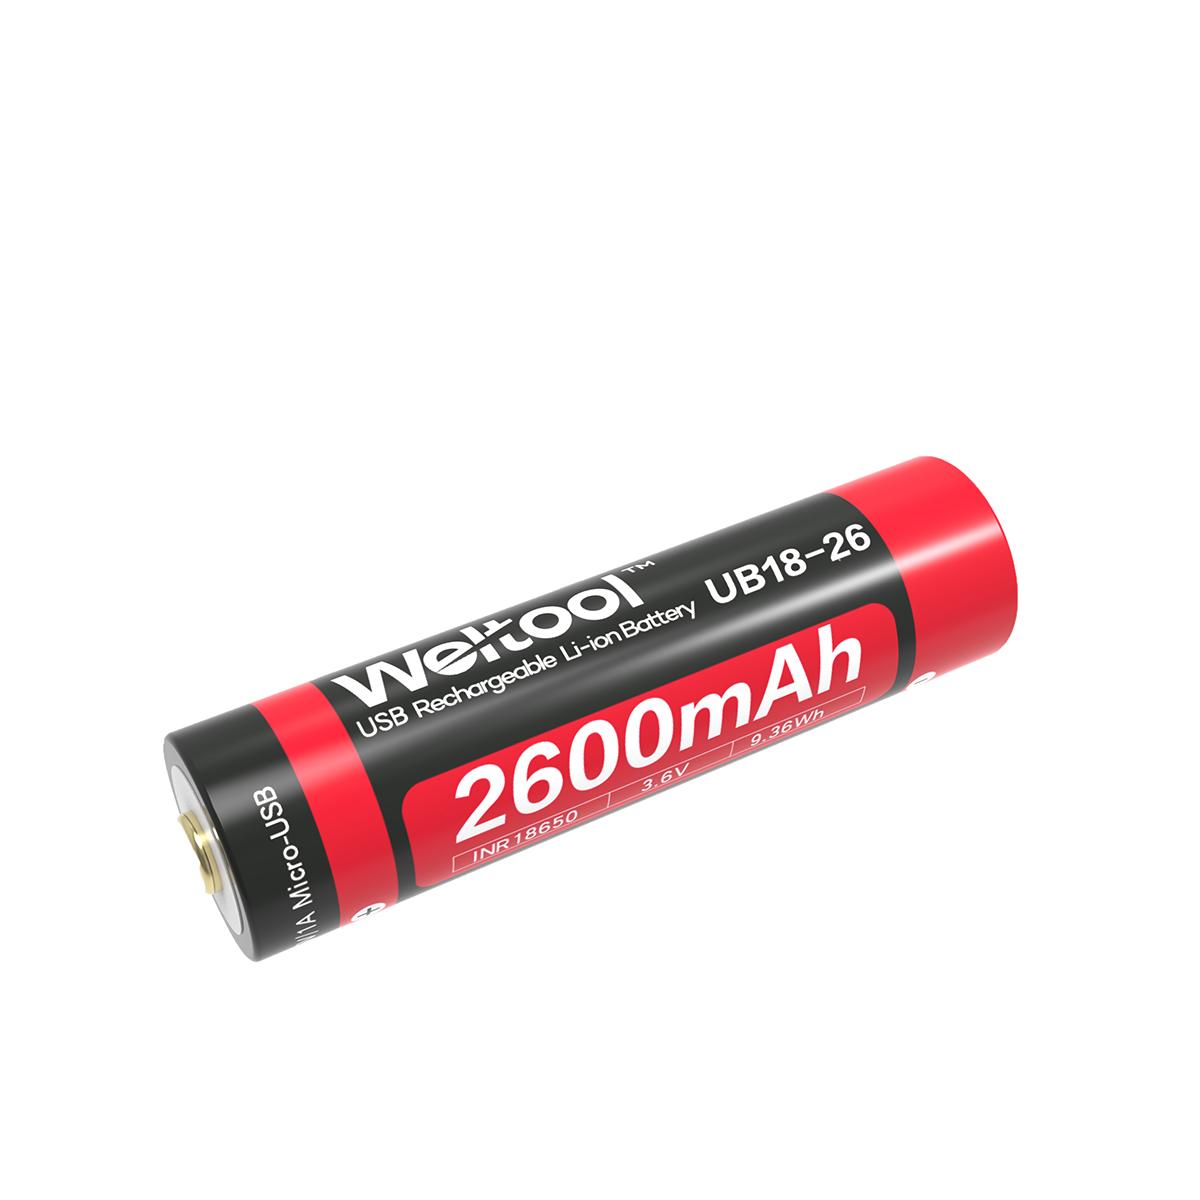 Weltool UB18-26 18650 2600mAh USB Rechargeable Li-ion Battery